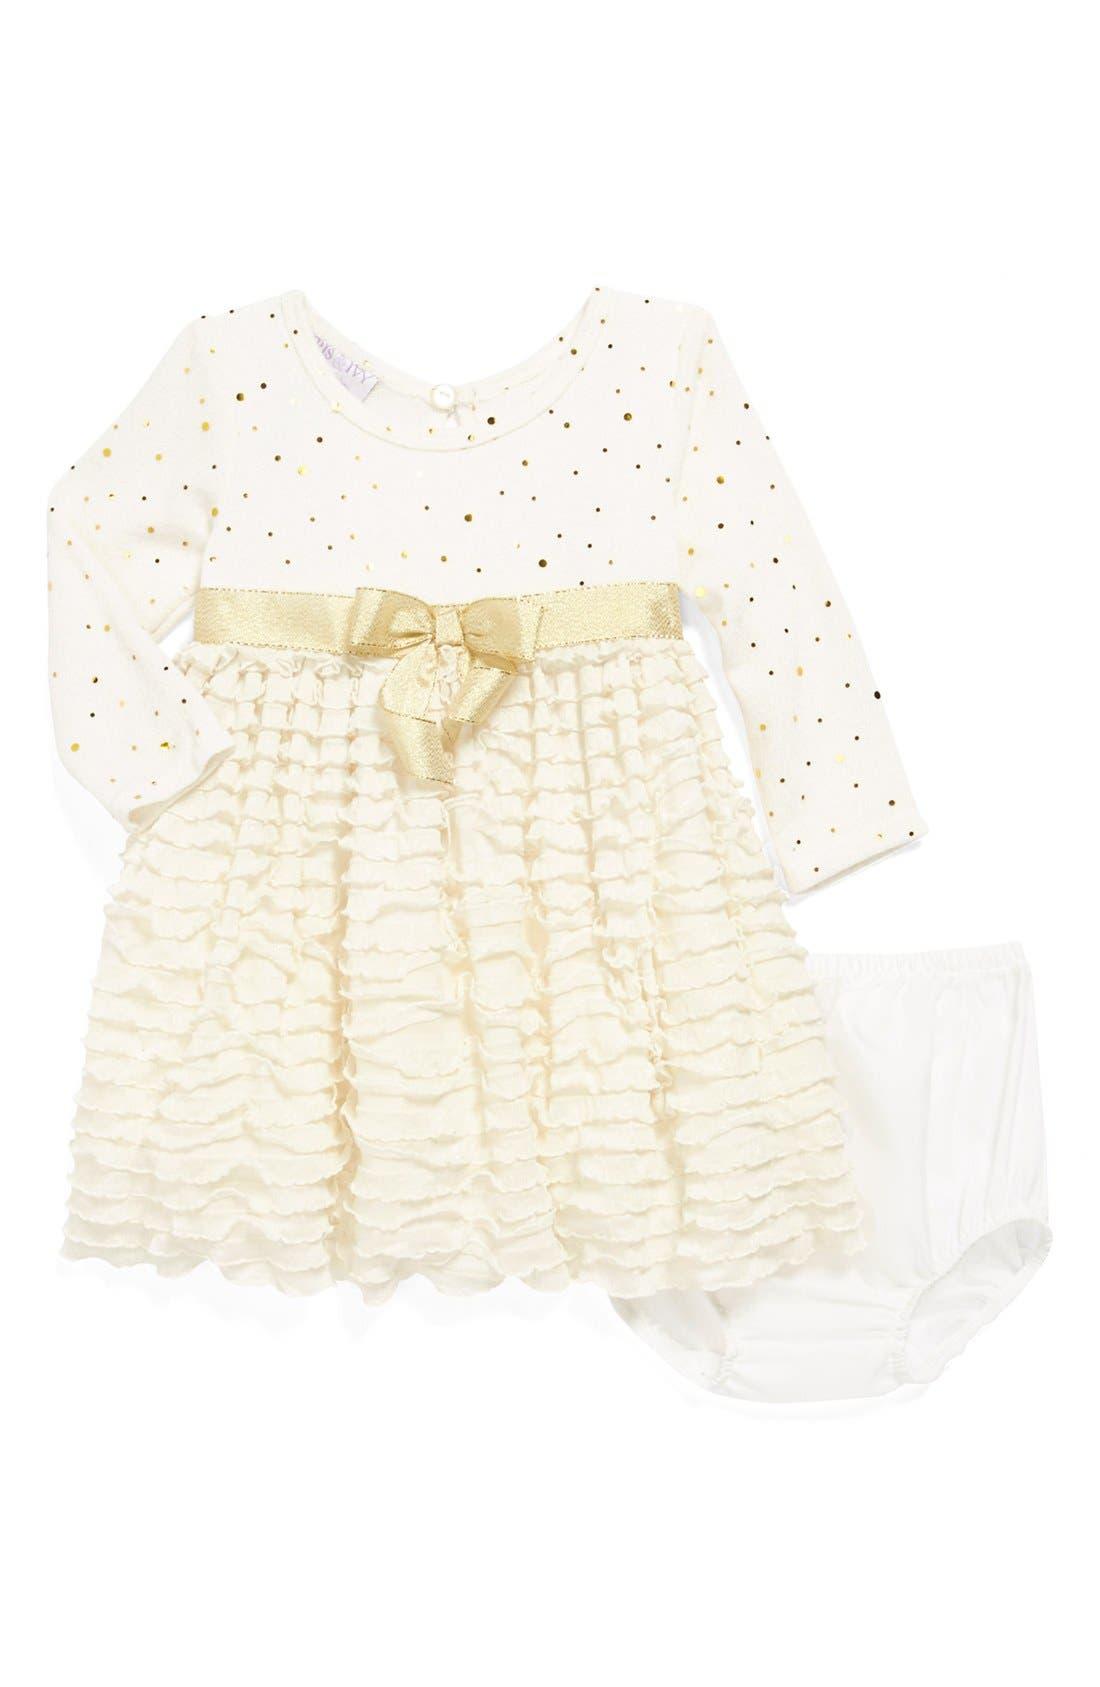 Alternate Image 1 Selected - Iris & Ivy Glitter Knit Ruffle Skirt Dress (Baby Girls)